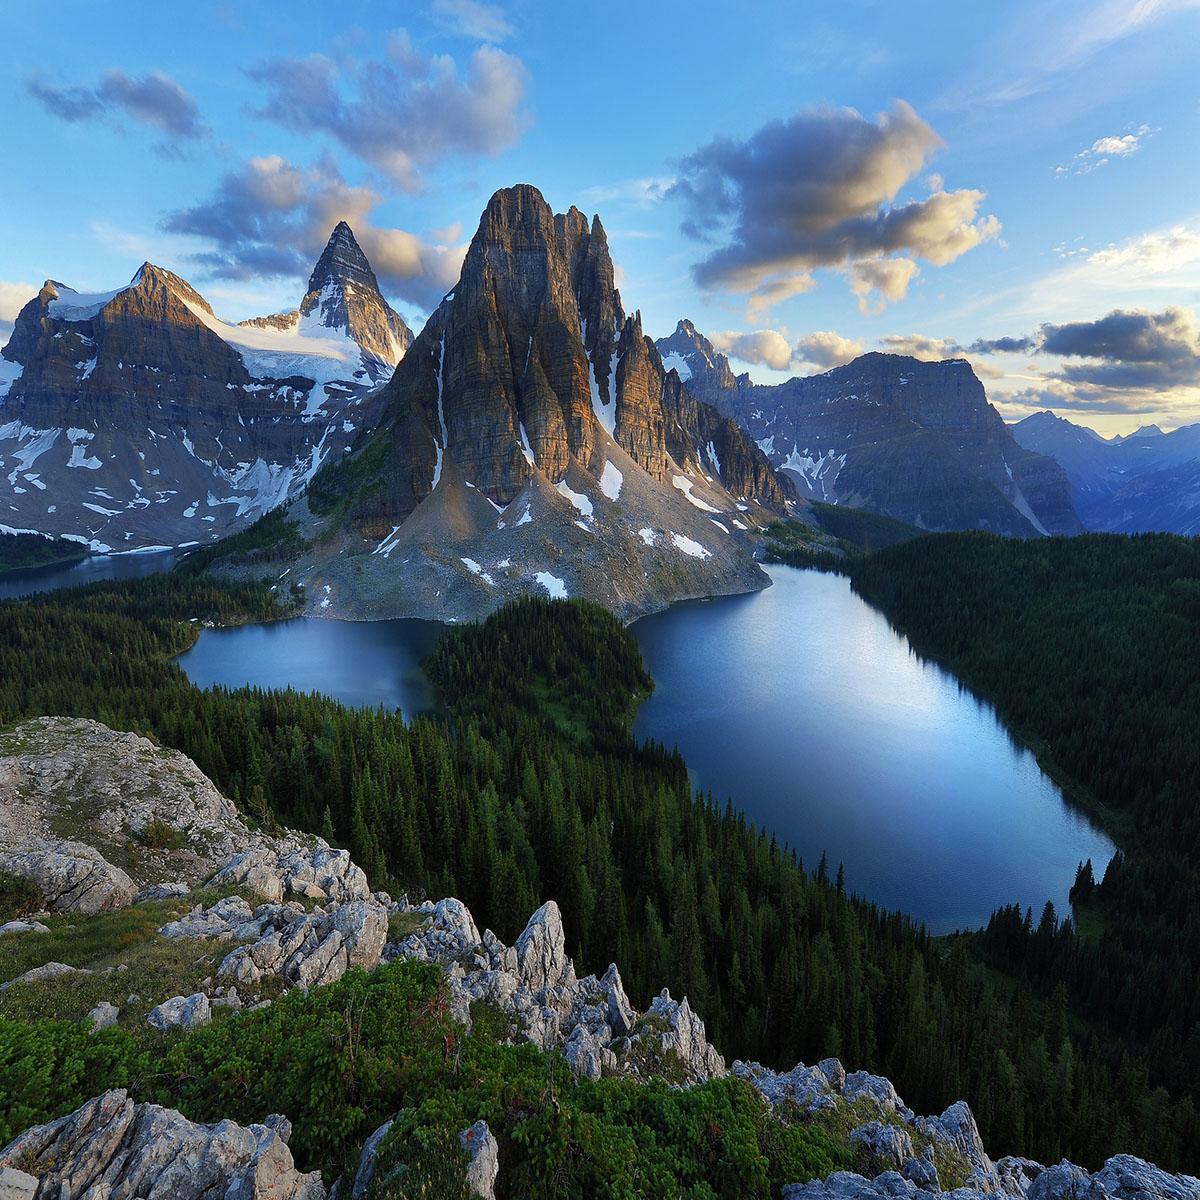 Top 5 Mountains Destinations